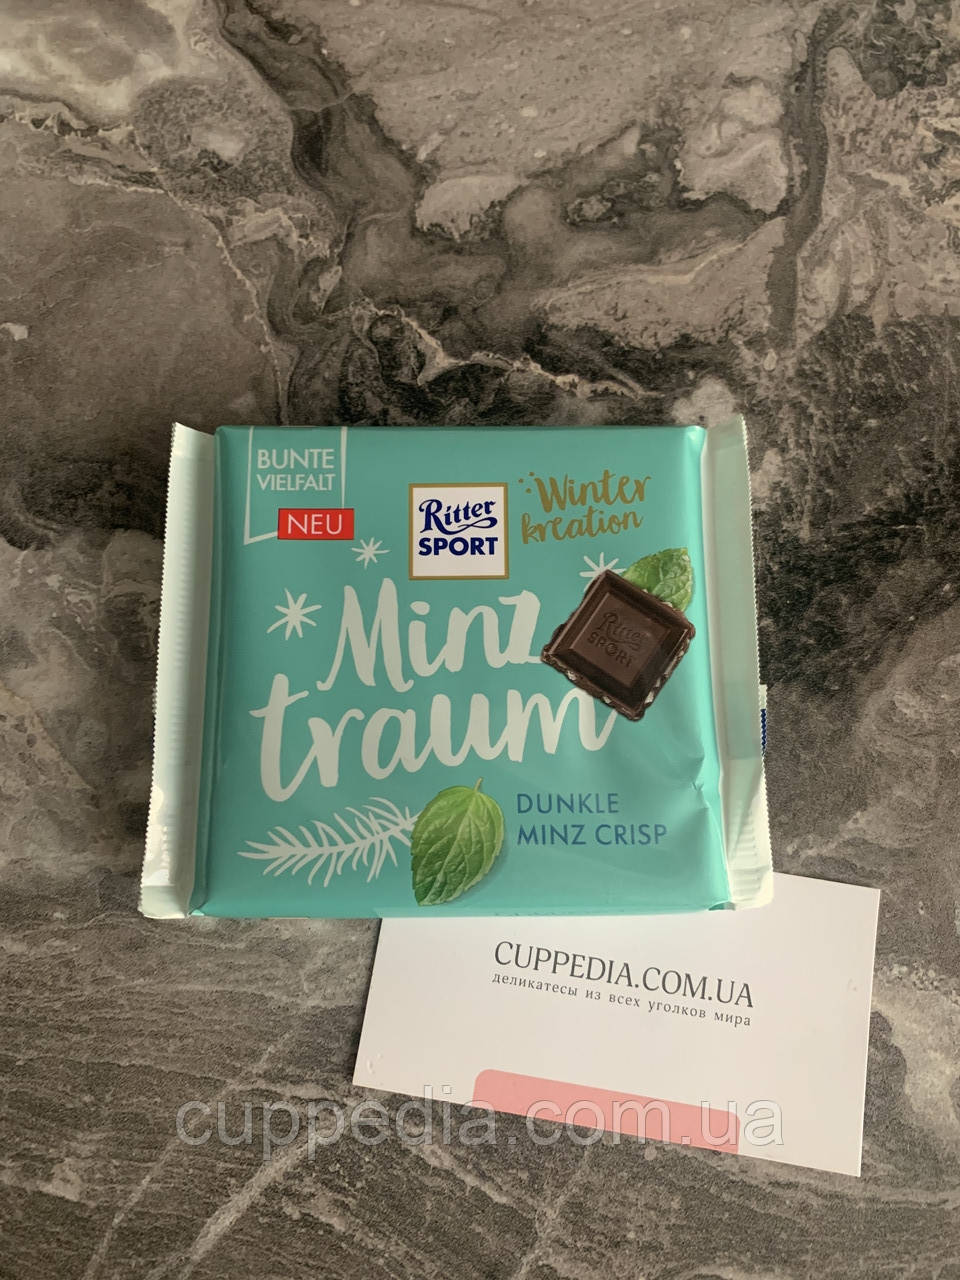 Ritter Sport Minz traum чорний шоколад з м'ятою 100 грм